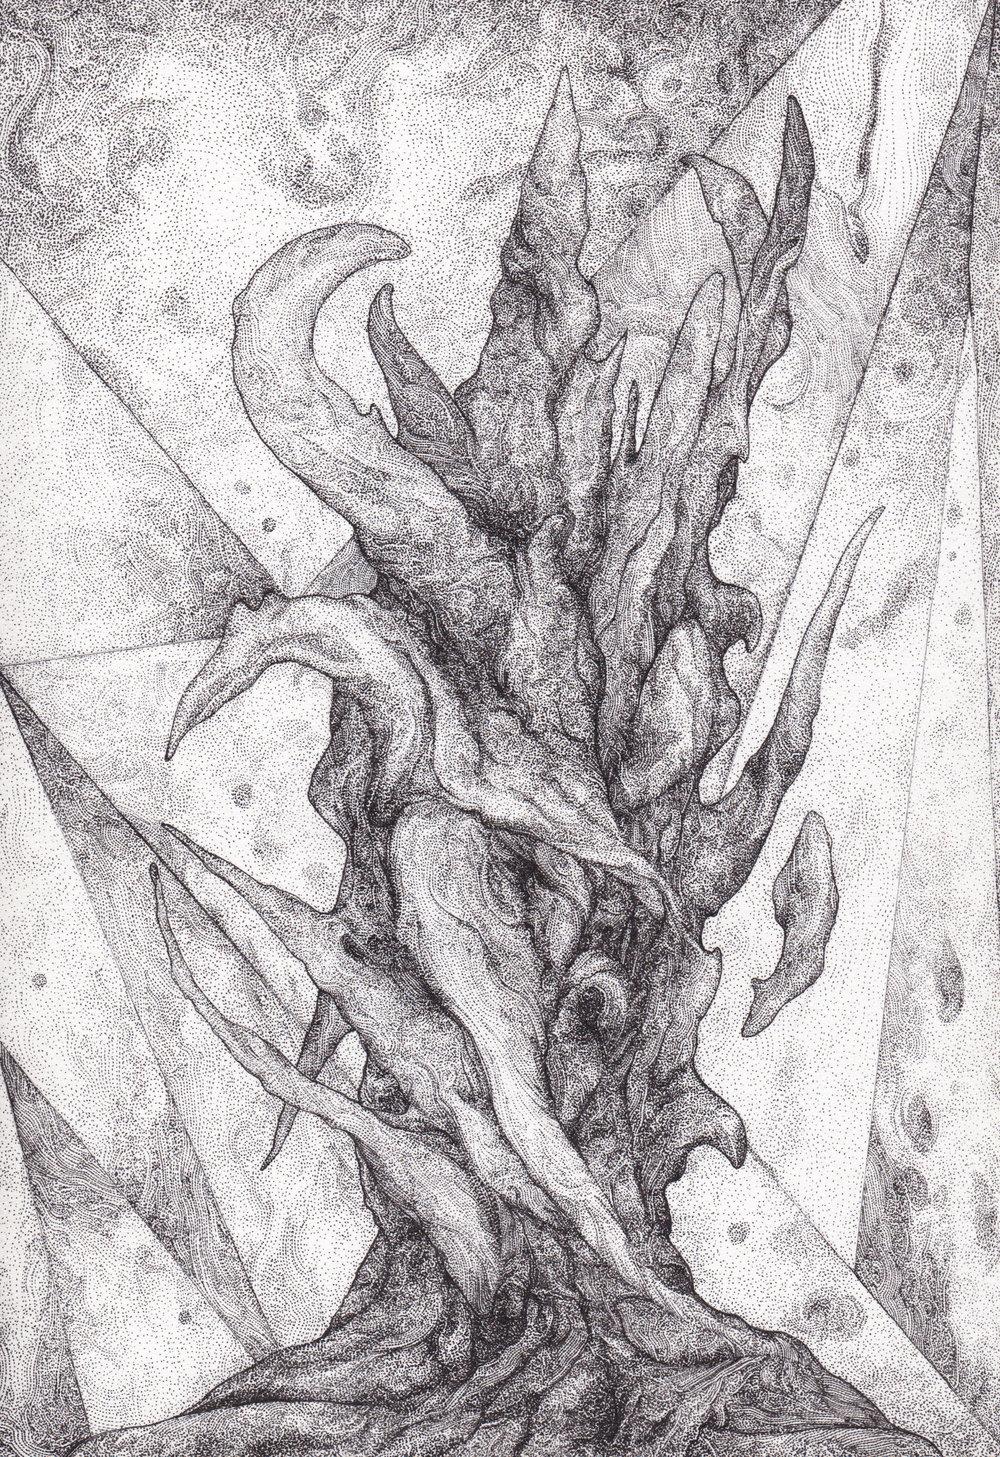 Sculptedcactus.jpg